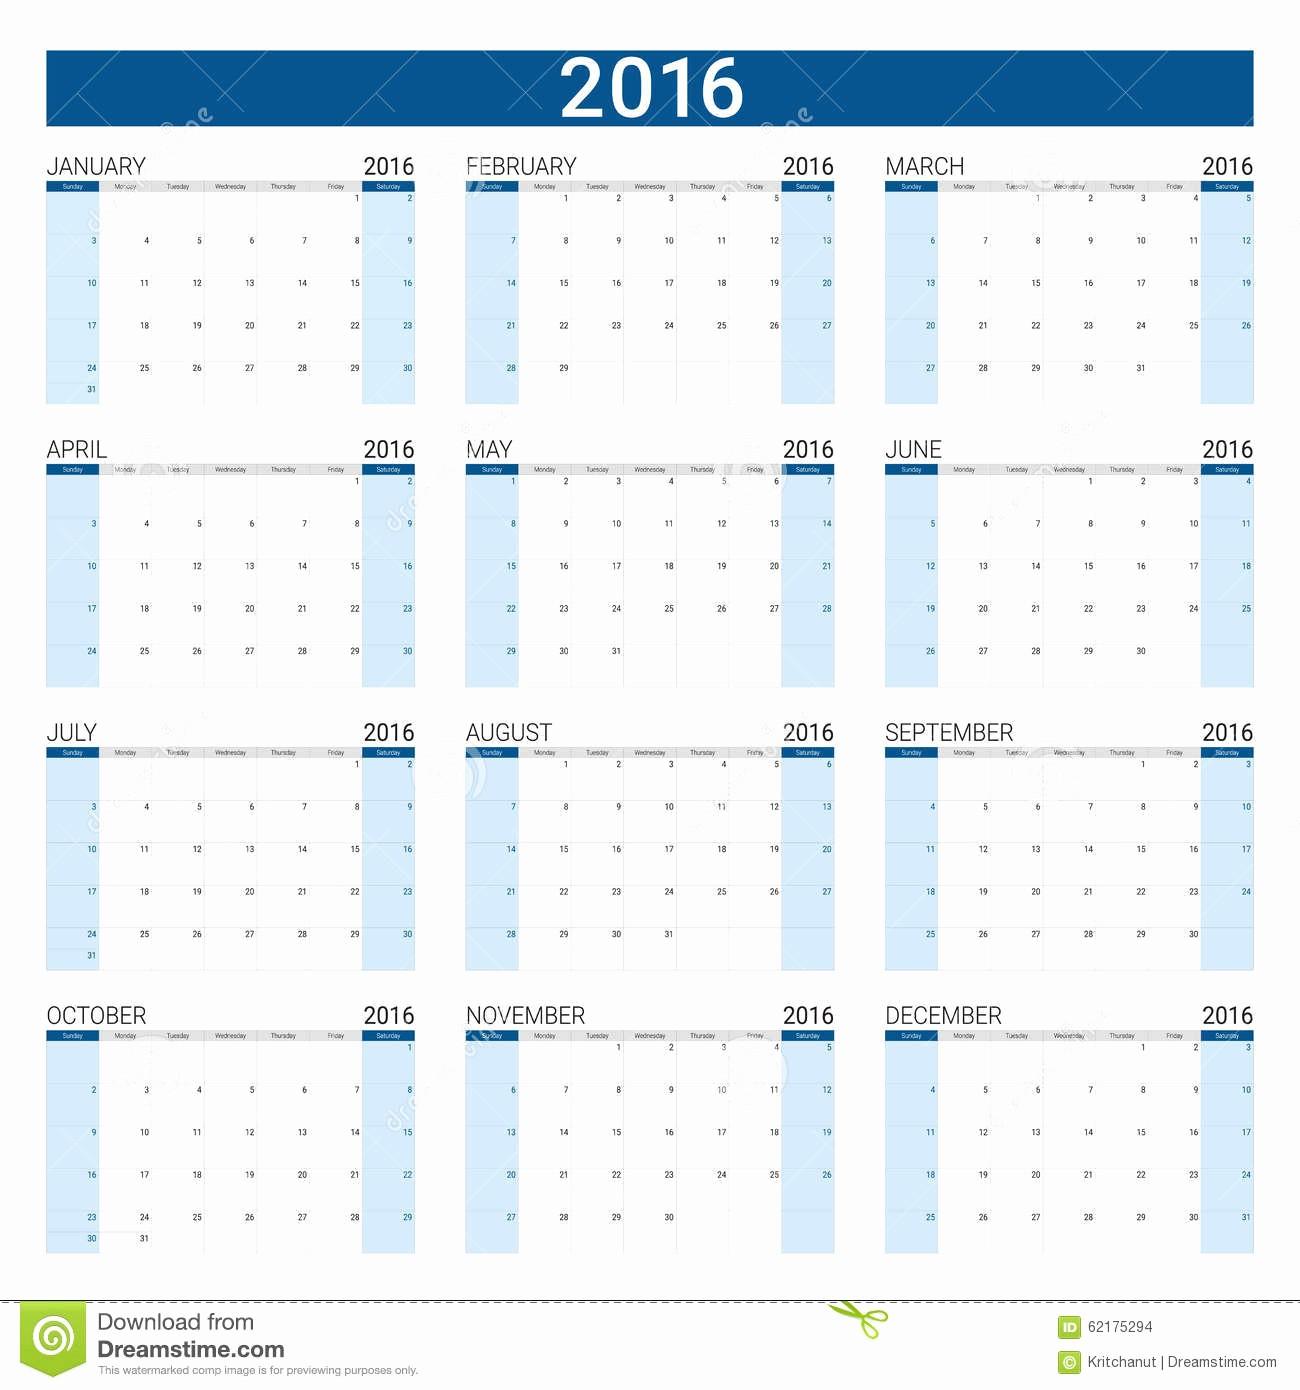 12 Month Calendar for 2016 Elegant 2016 Calendar 12 Months Stock Vector Image